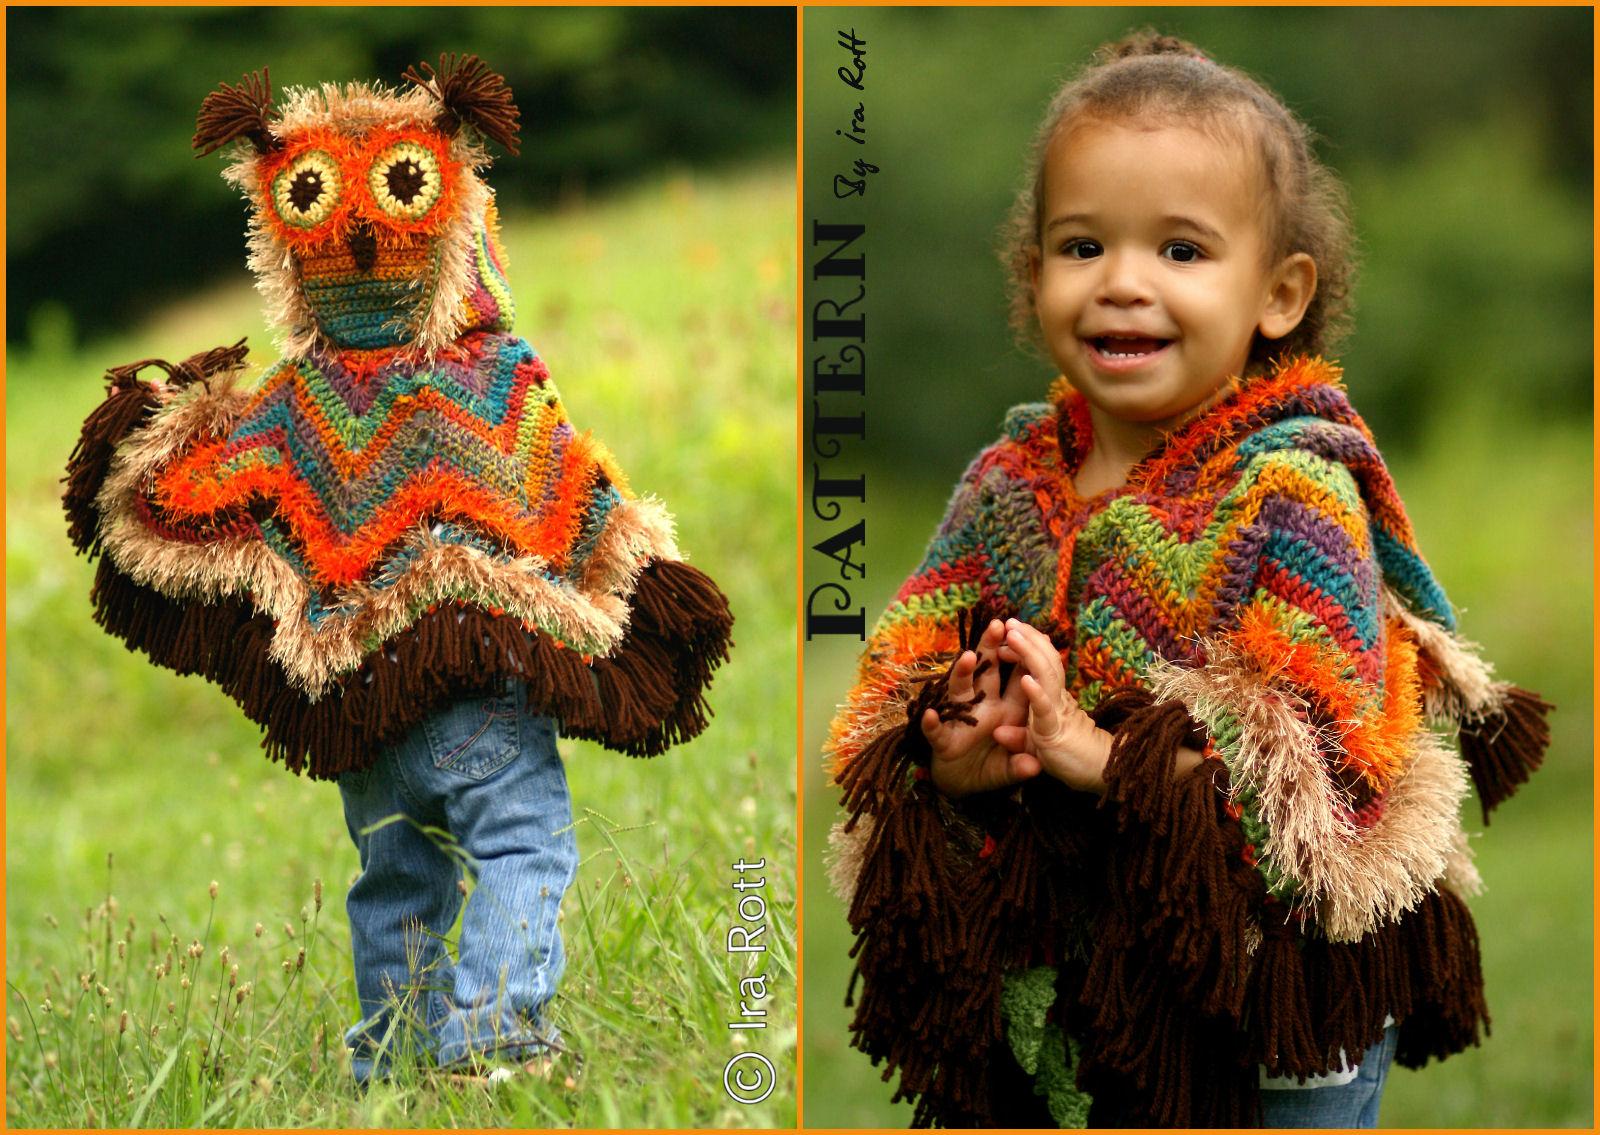 Fashion Crochet Design By Ira Rott: Acorn Owl Poncho